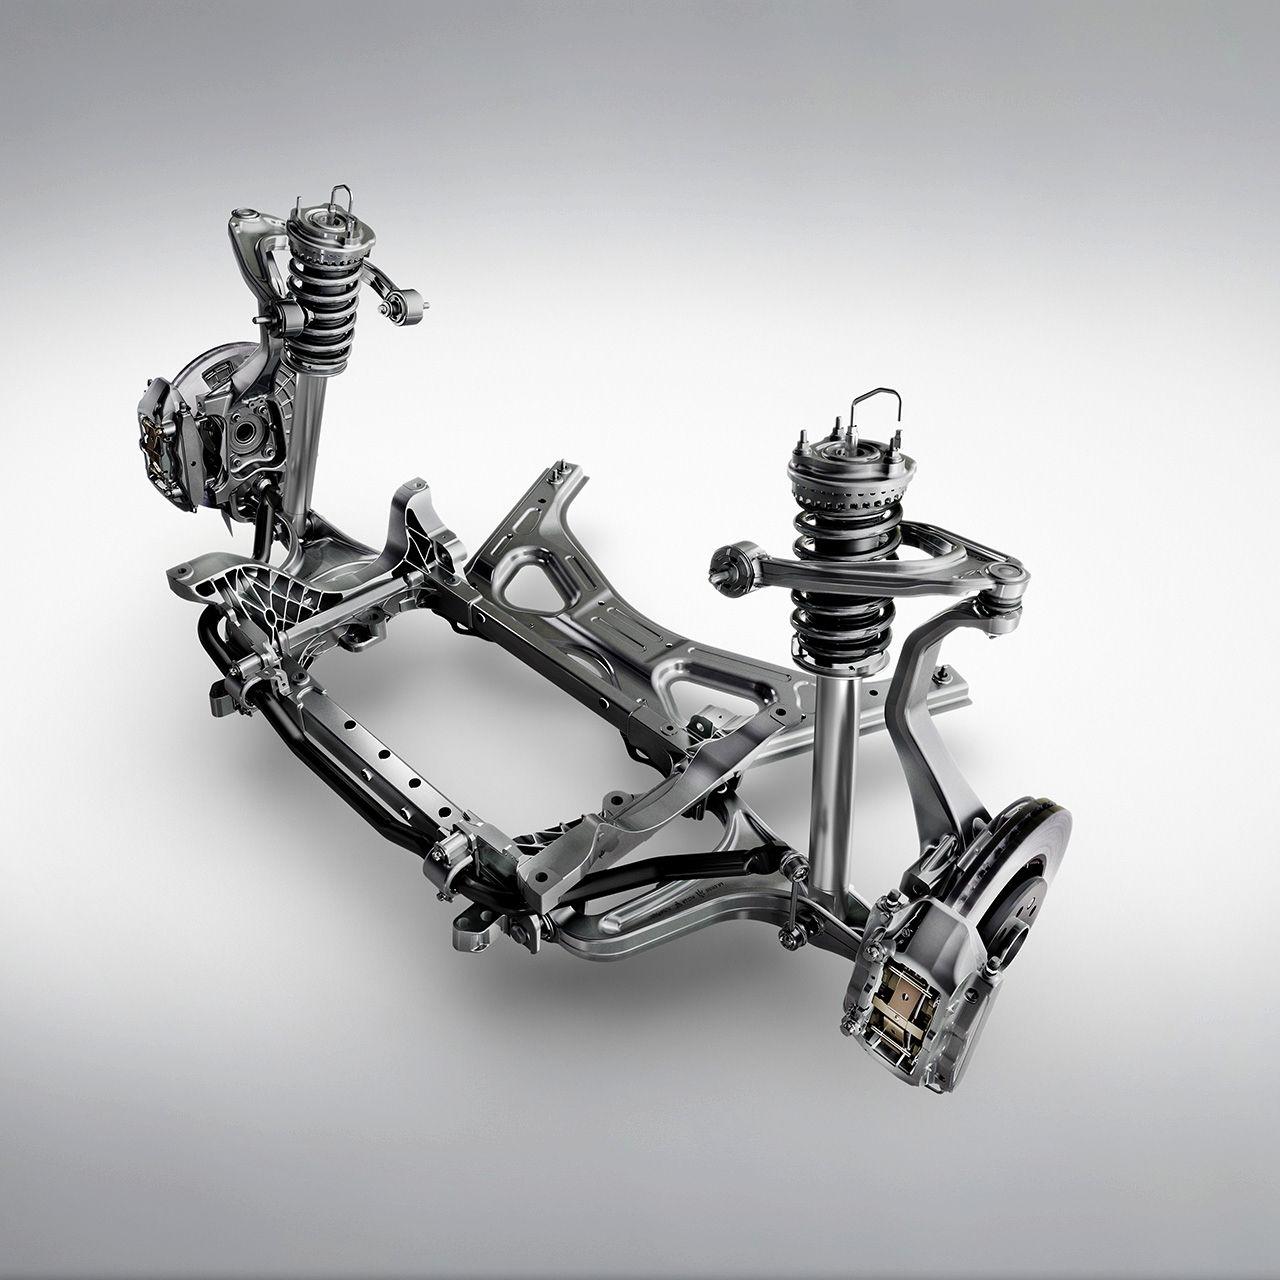 Skyhook Radaufhängung des Maserati Ghibli